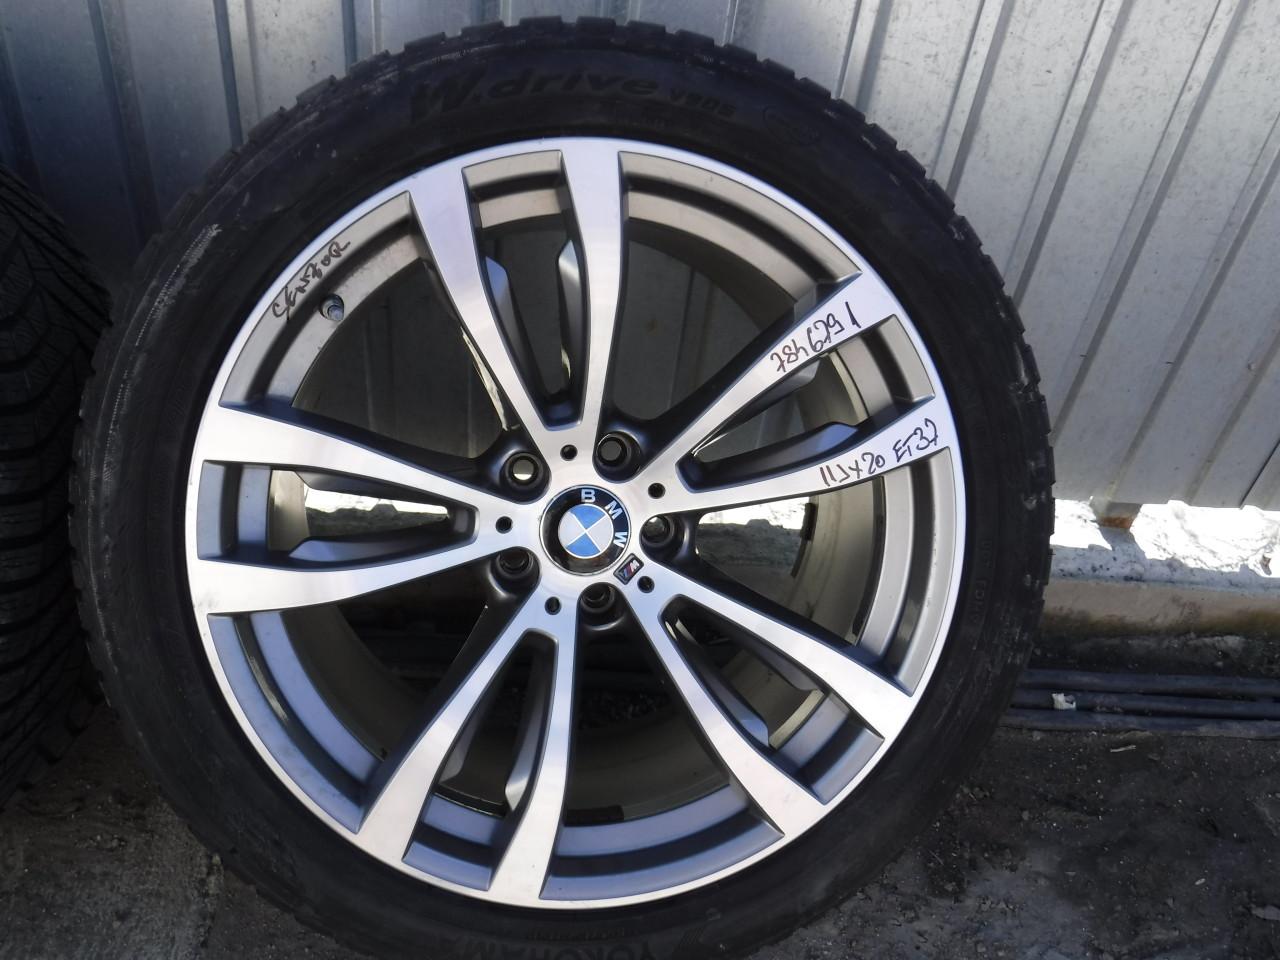 Jante BMW 20 X5 X6 F15 ,F16 style 469 M 315 35 R20 / 275 40 R20 Yokohama  iarnă